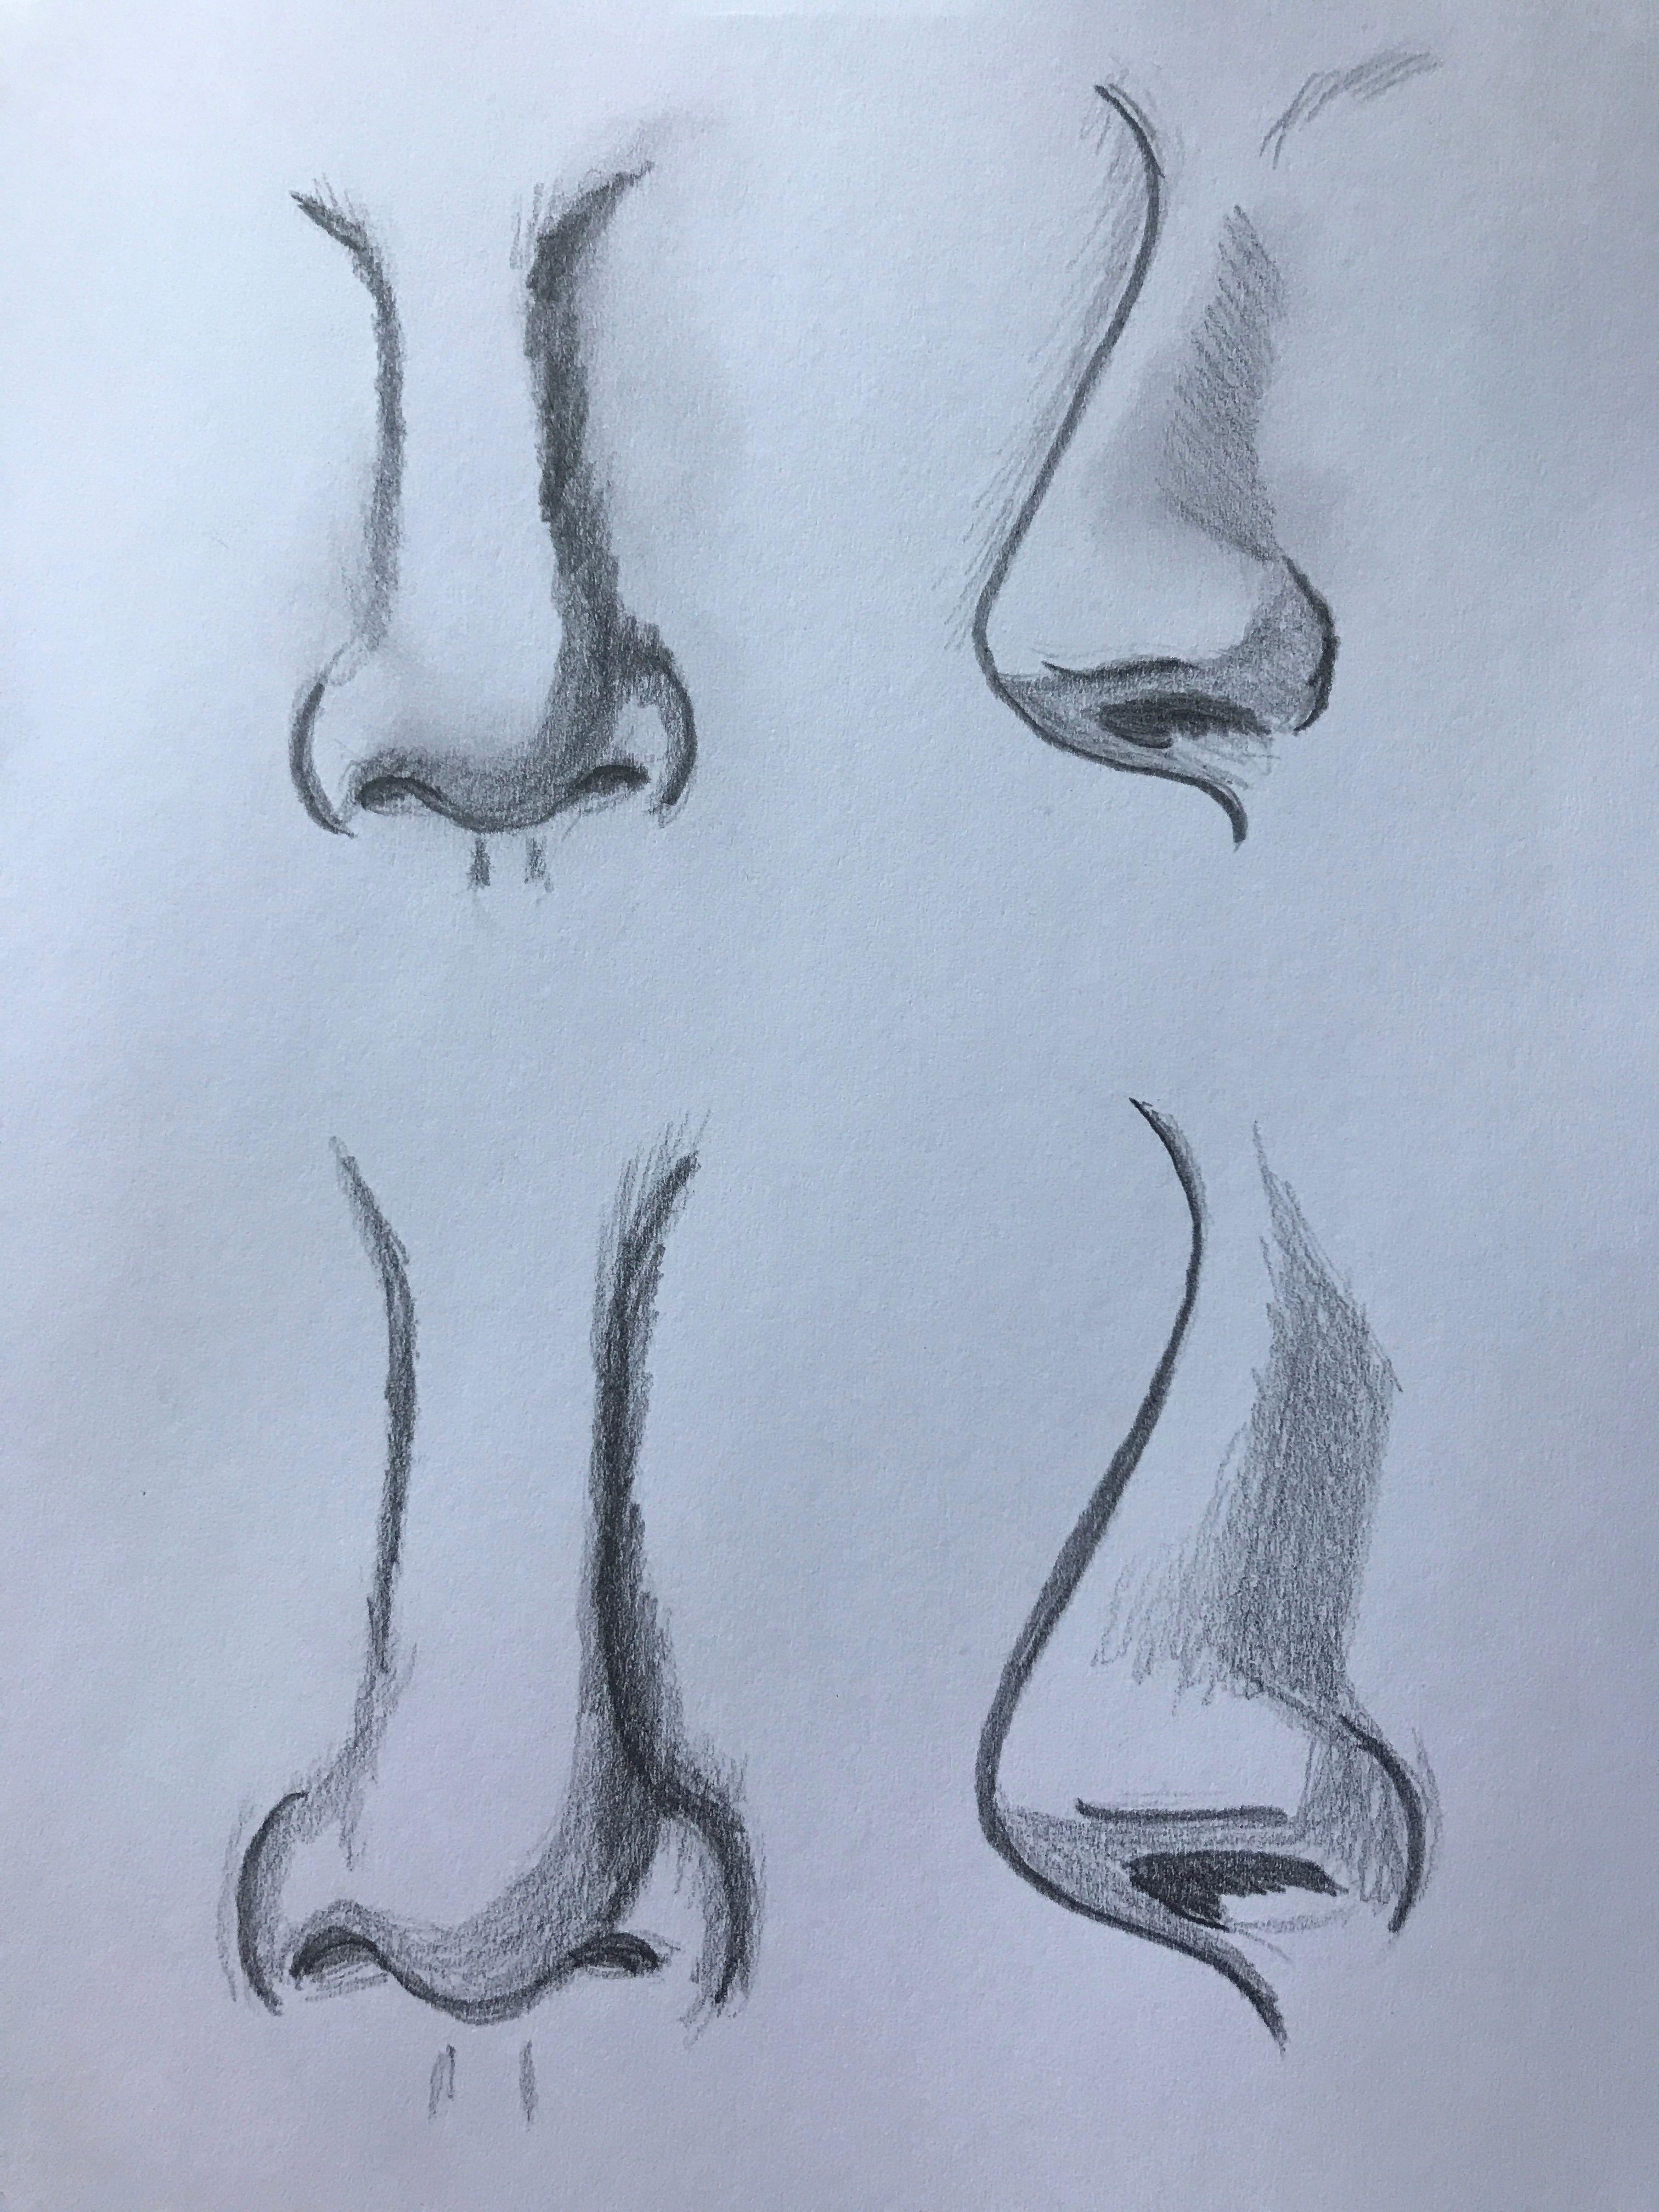 Tipos De Nariz A Lapiz Dibujo Nariz Tutorial De Dibujo Como Dibujar Nariz